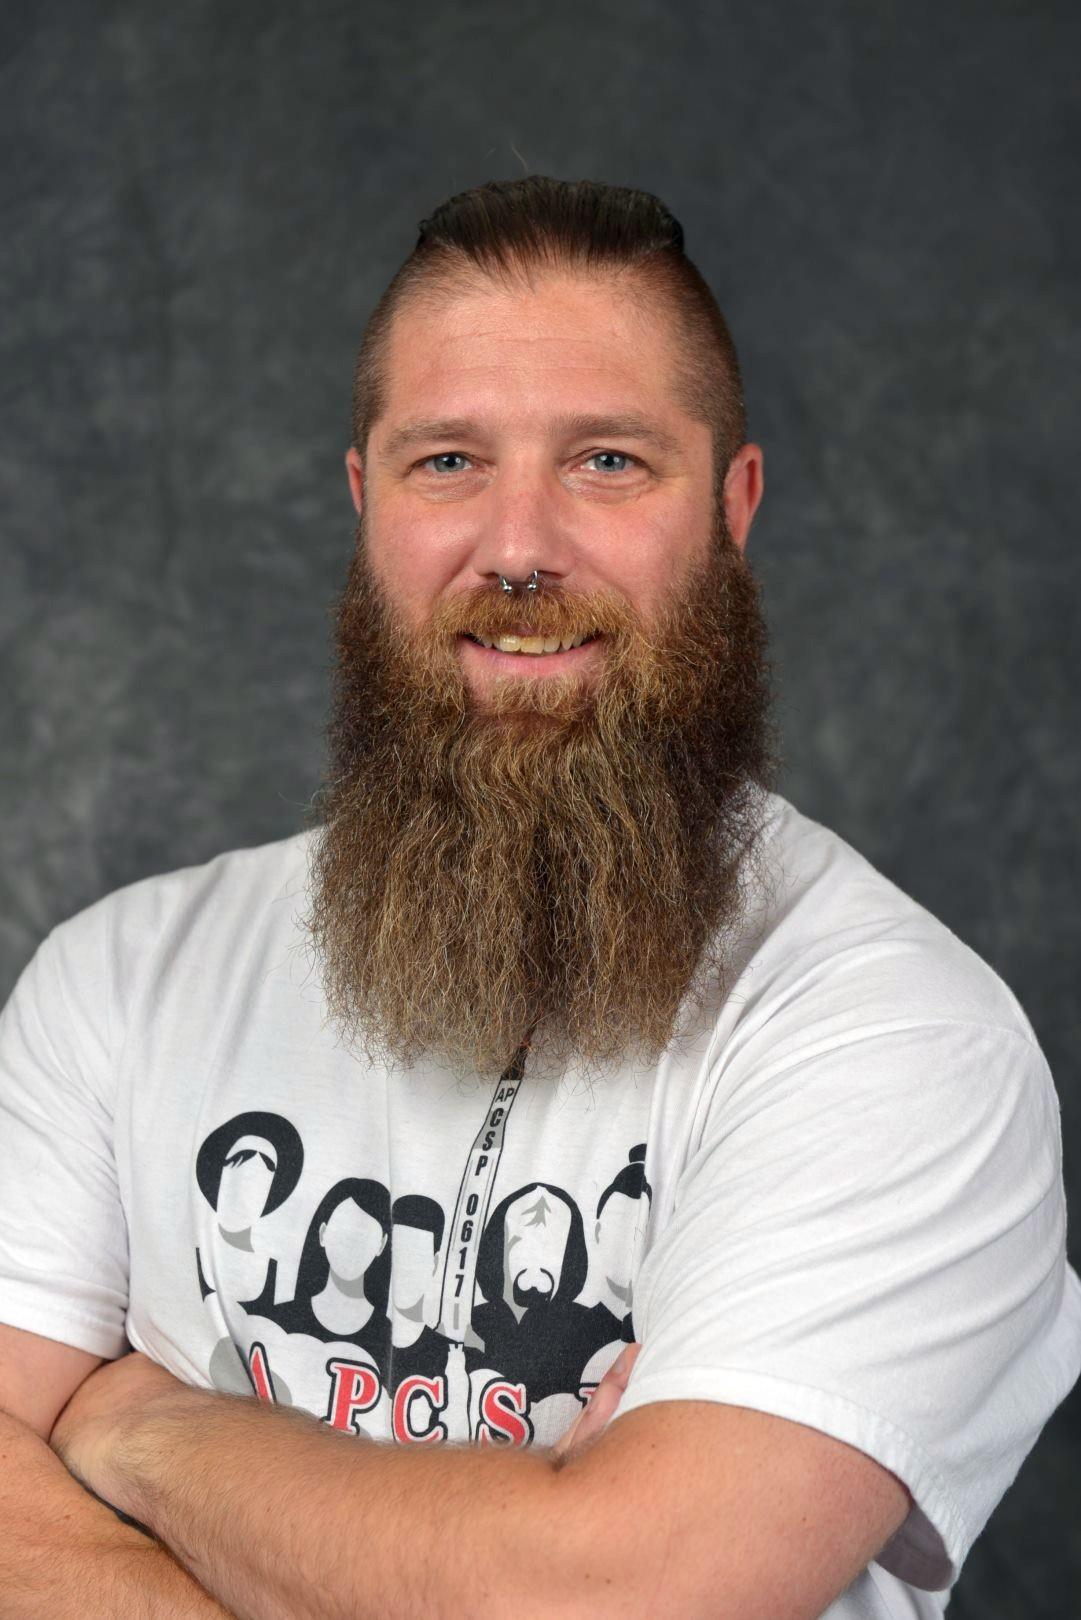 Jason Bohrer